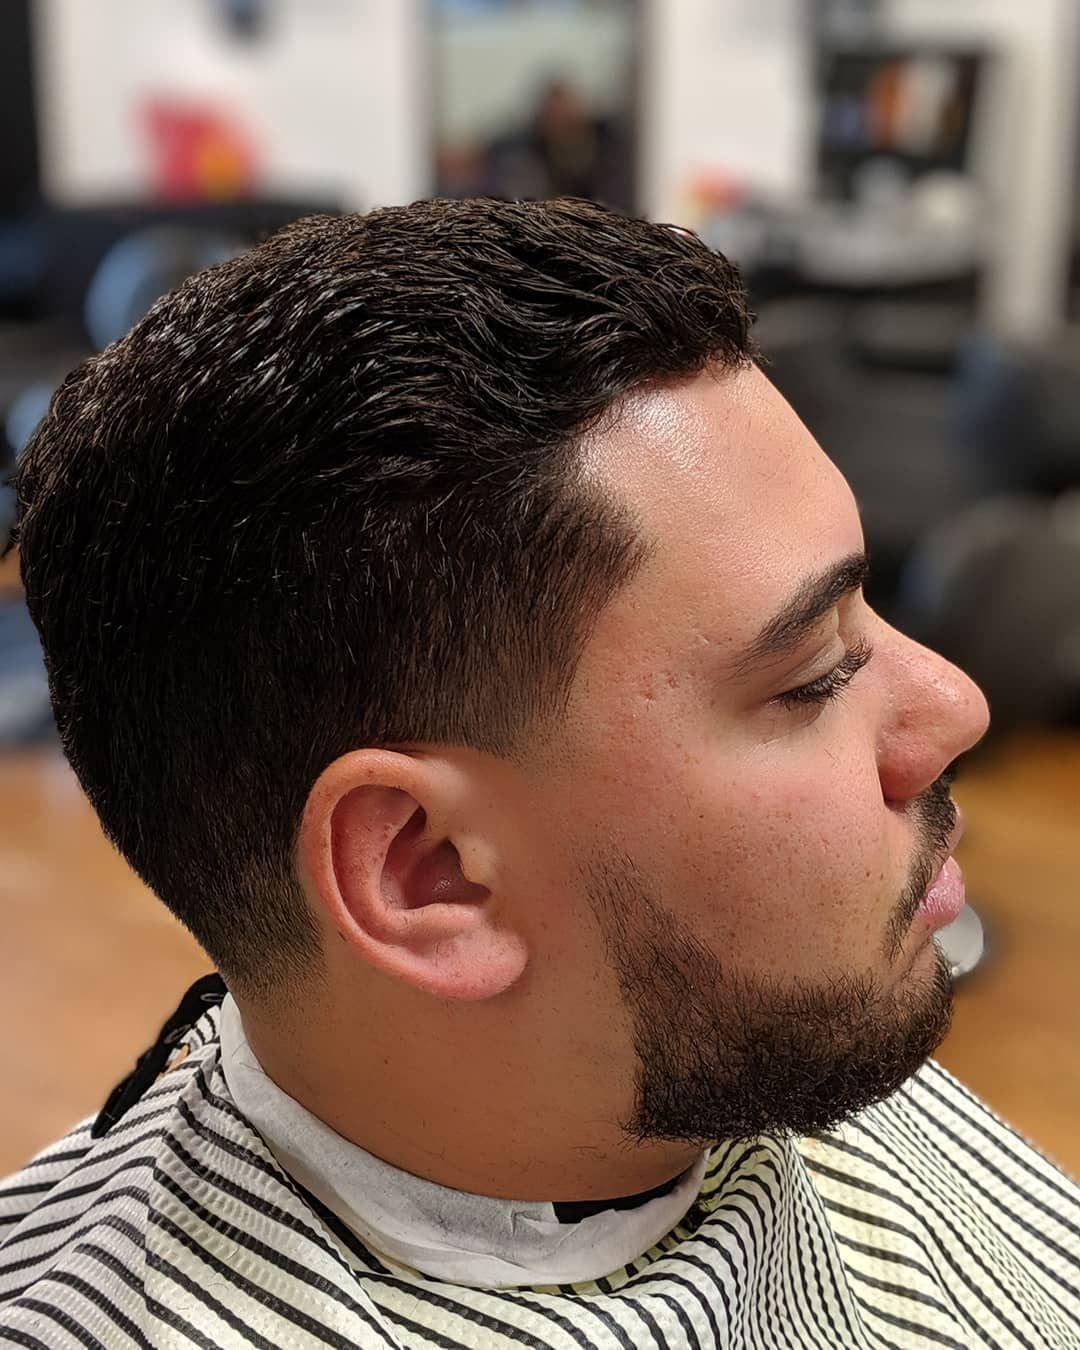 Best Mens Haircut Chicago Il Men S Professional Haircuts For Textured Hair Curly Hair Haircuts In 2020 Haircuts For Men Cool Mens Haircuts Haircuts For Curly Hair